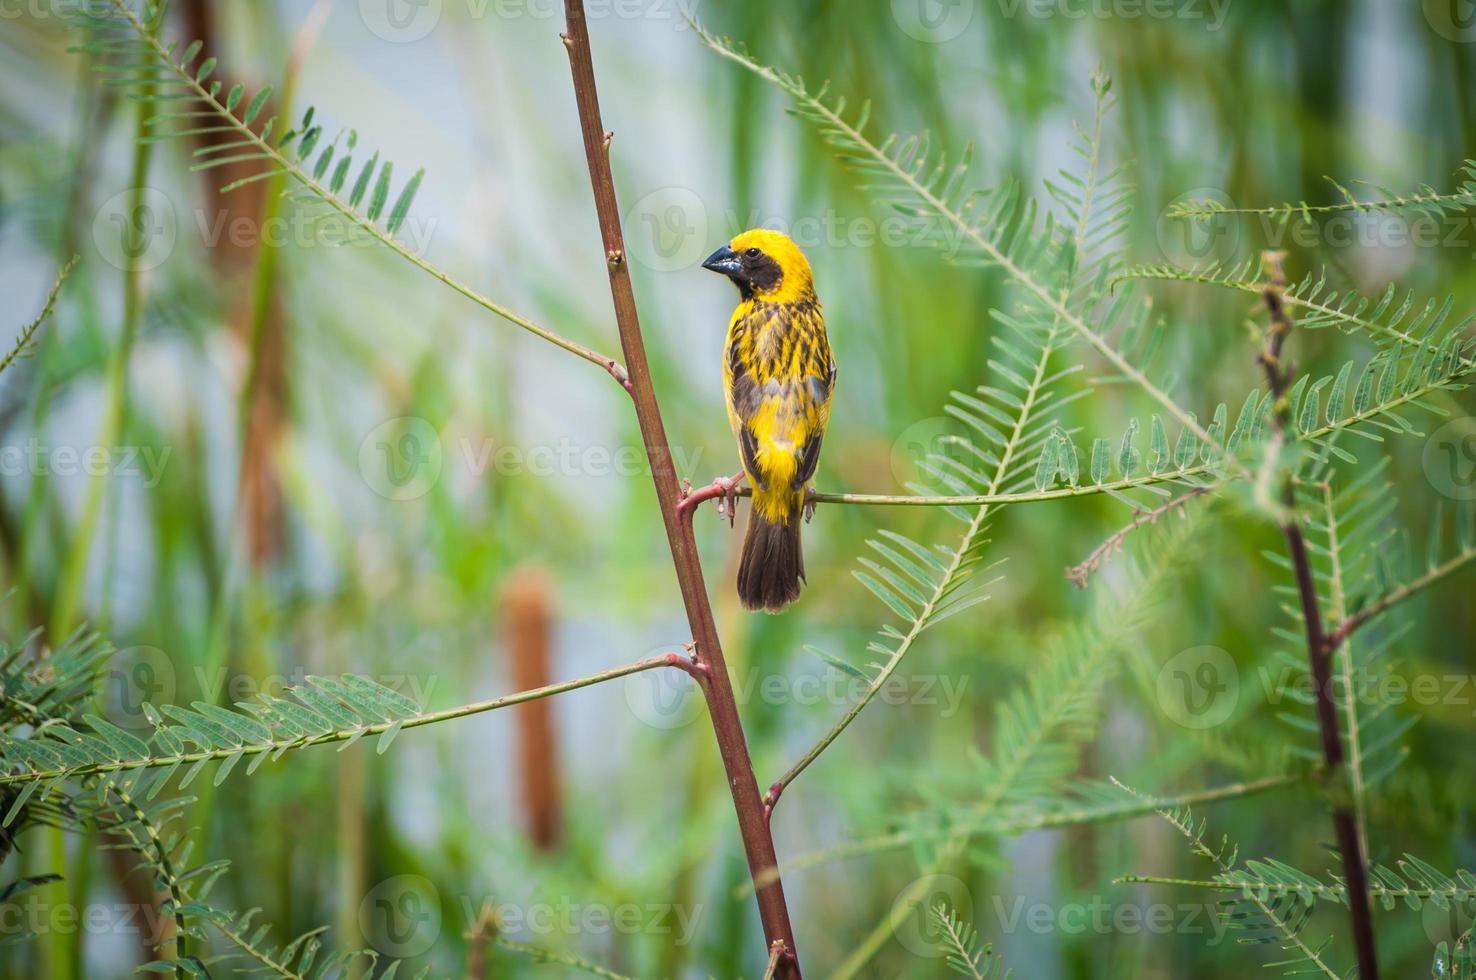 tejedor dorado asiático, pájaro macho foto